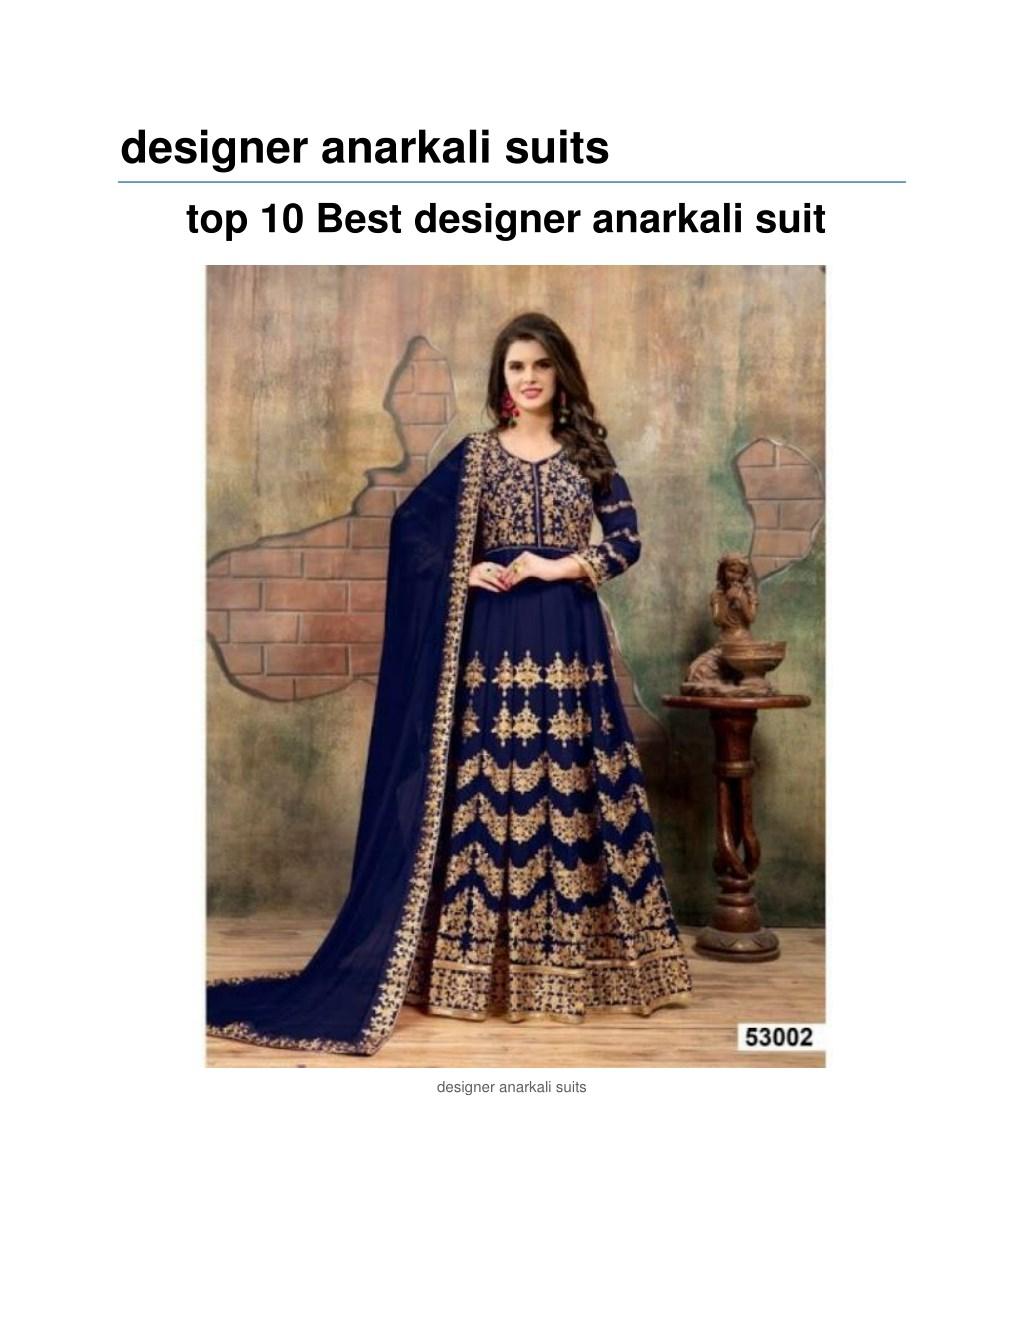 Ppt Salwar Suit Surat Designer Anarkali Suits Powerpoint Presentation Id 7904806